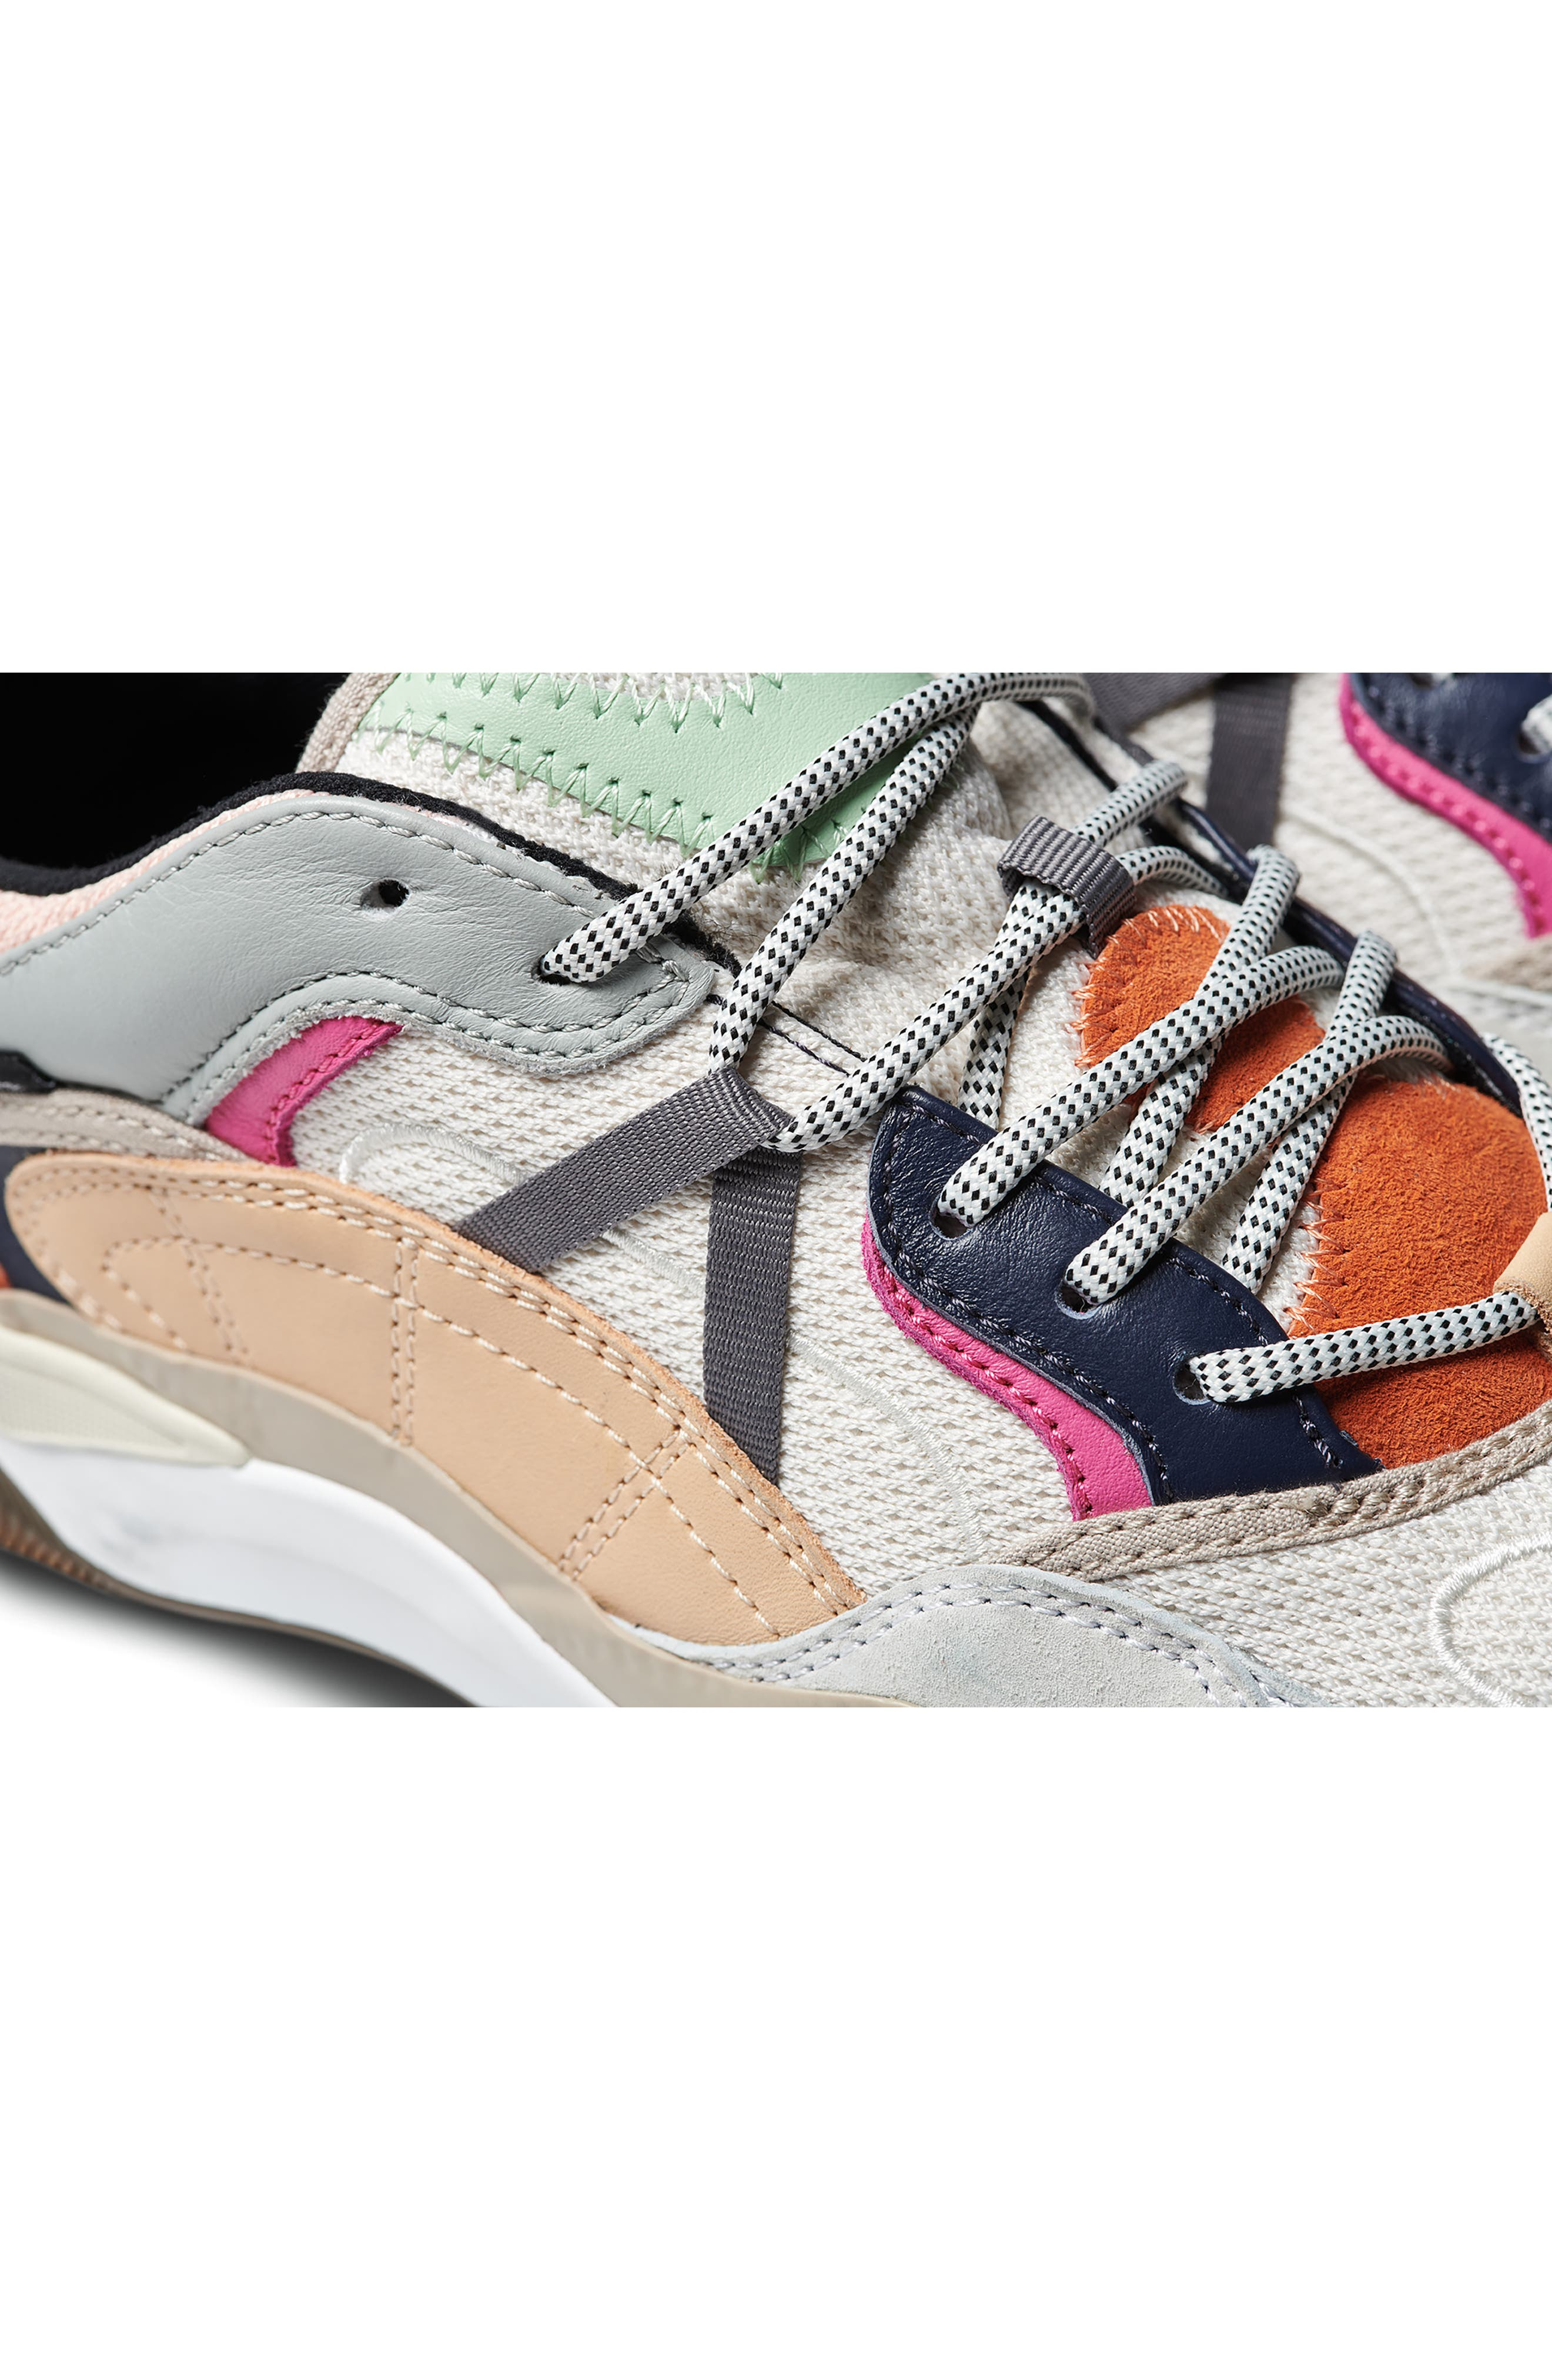 VANS,                             Varix WC Sneaker,                             Alternate thumbnail 9, color,                             TURTLEDOVE/ TRUE WHITE LEATHER